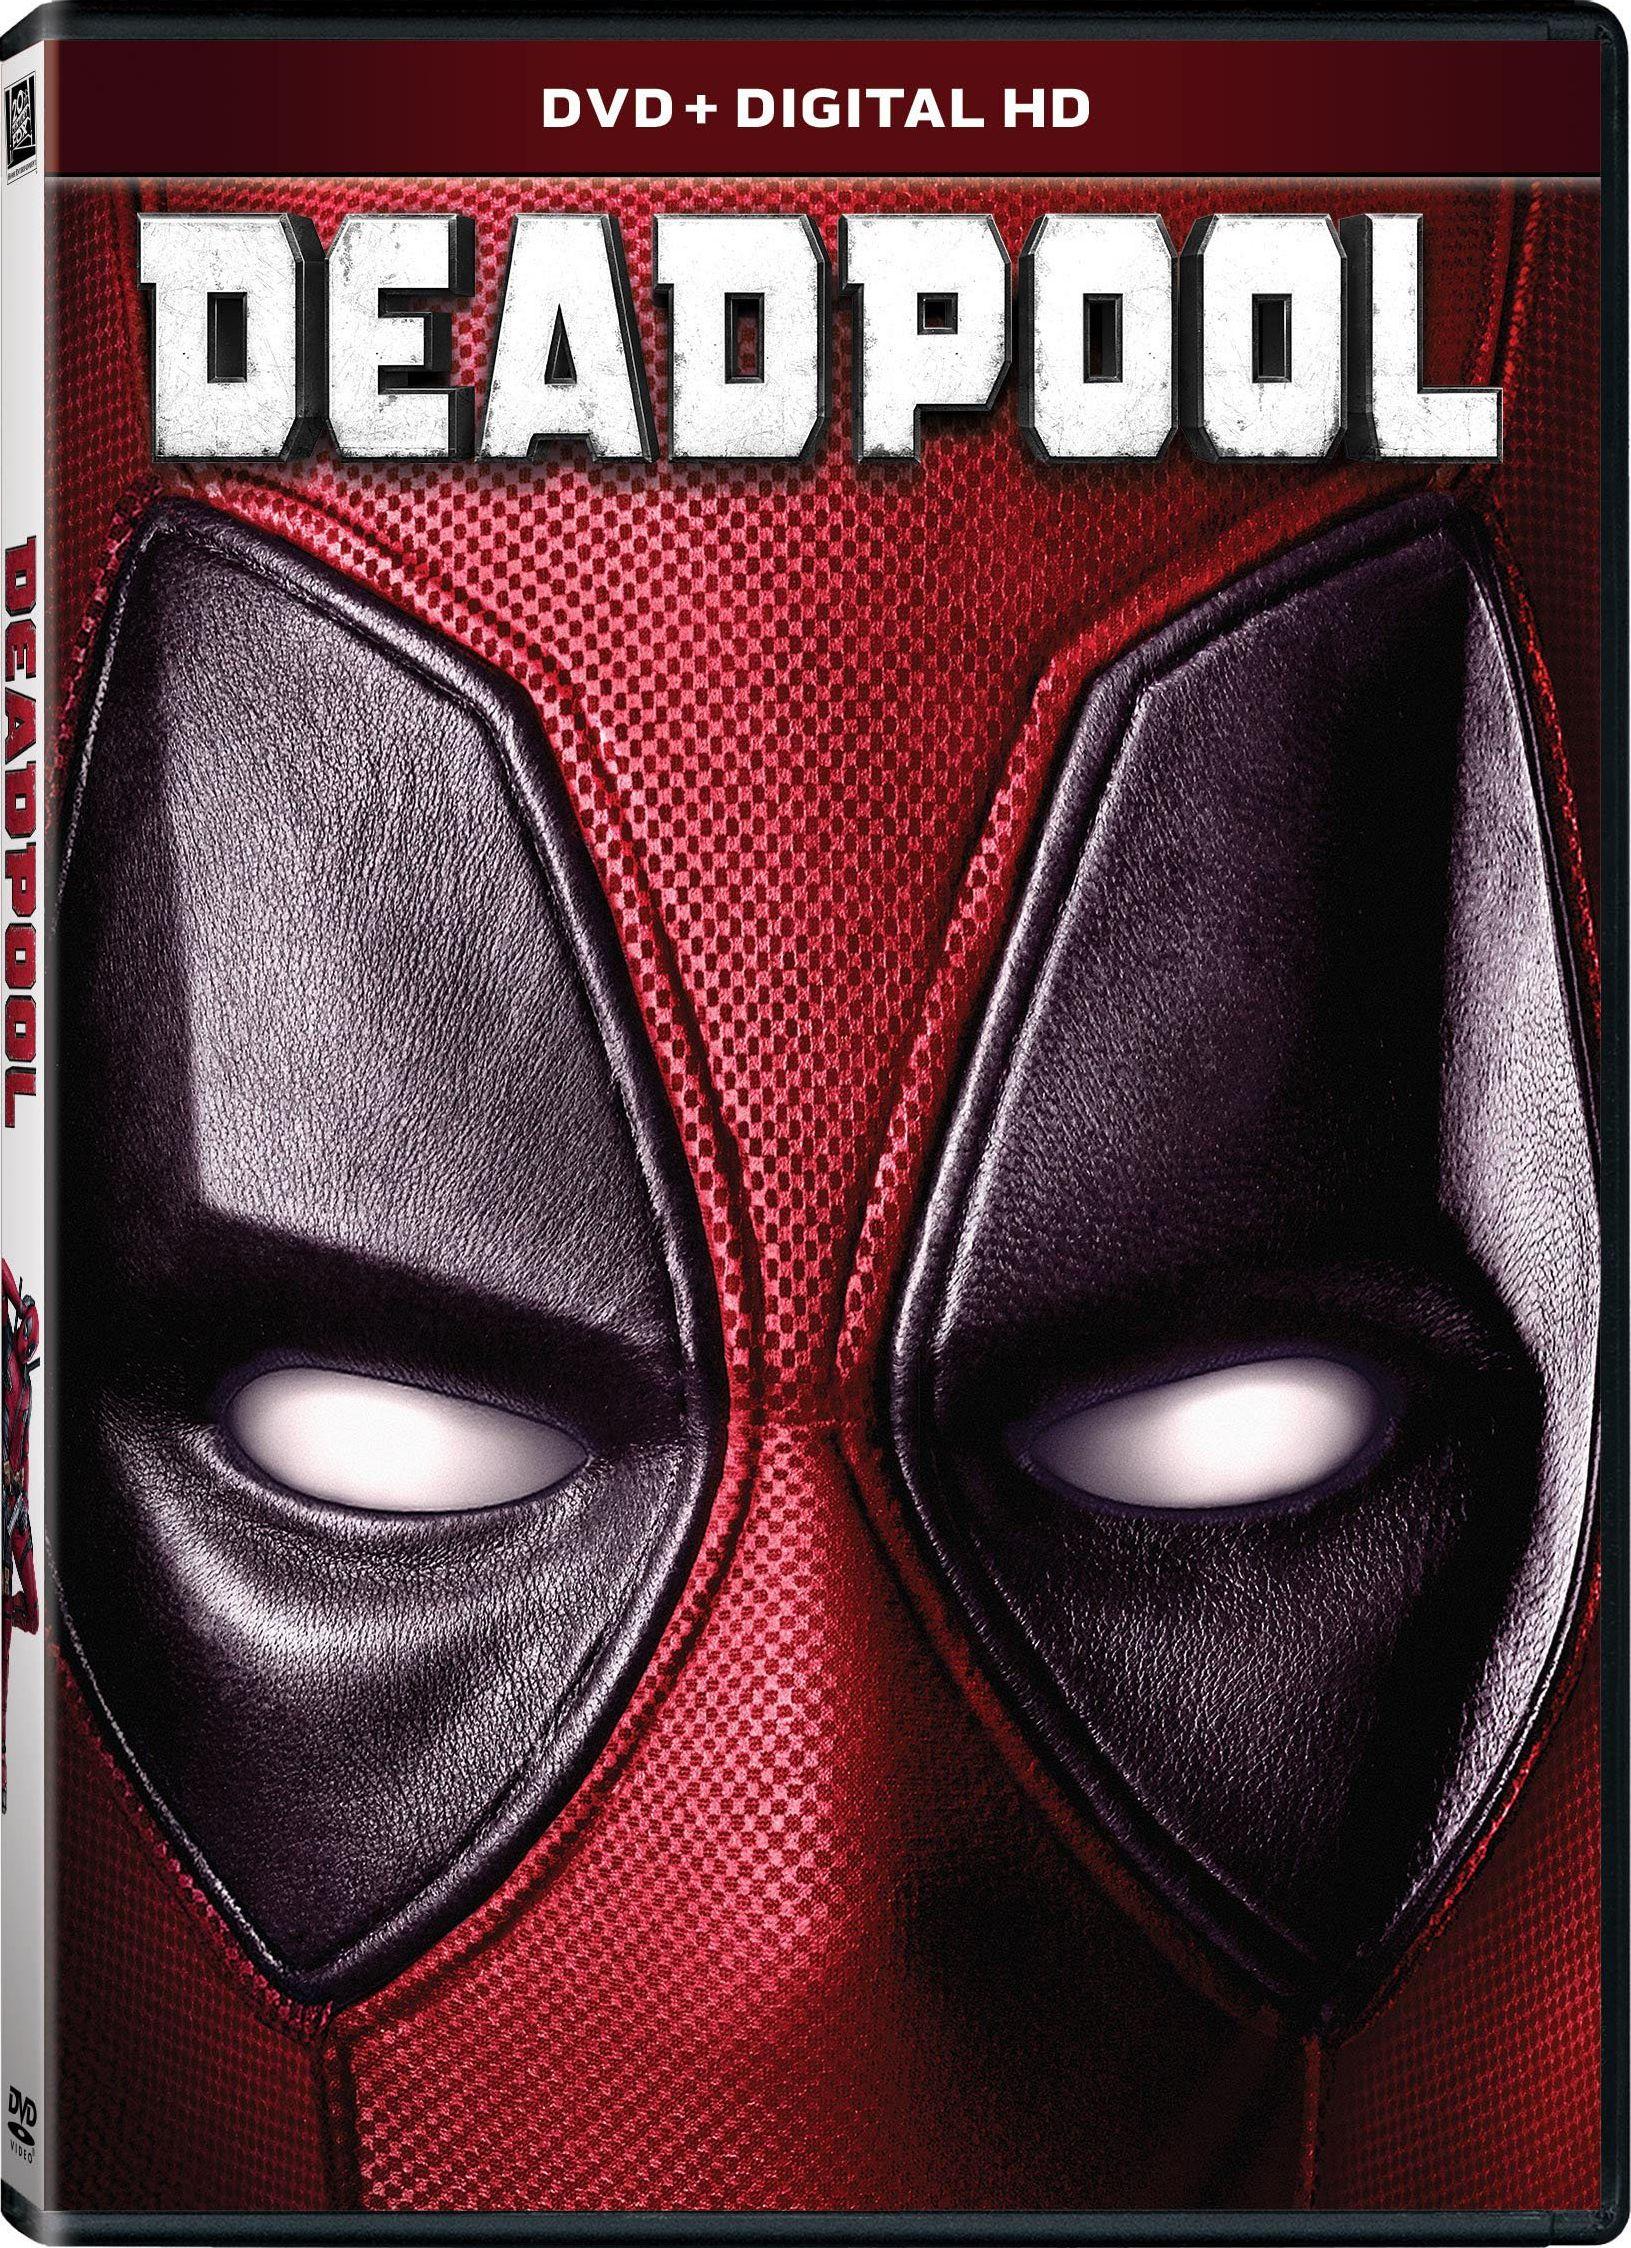 Deadpool DVD Release Date May 10 2016